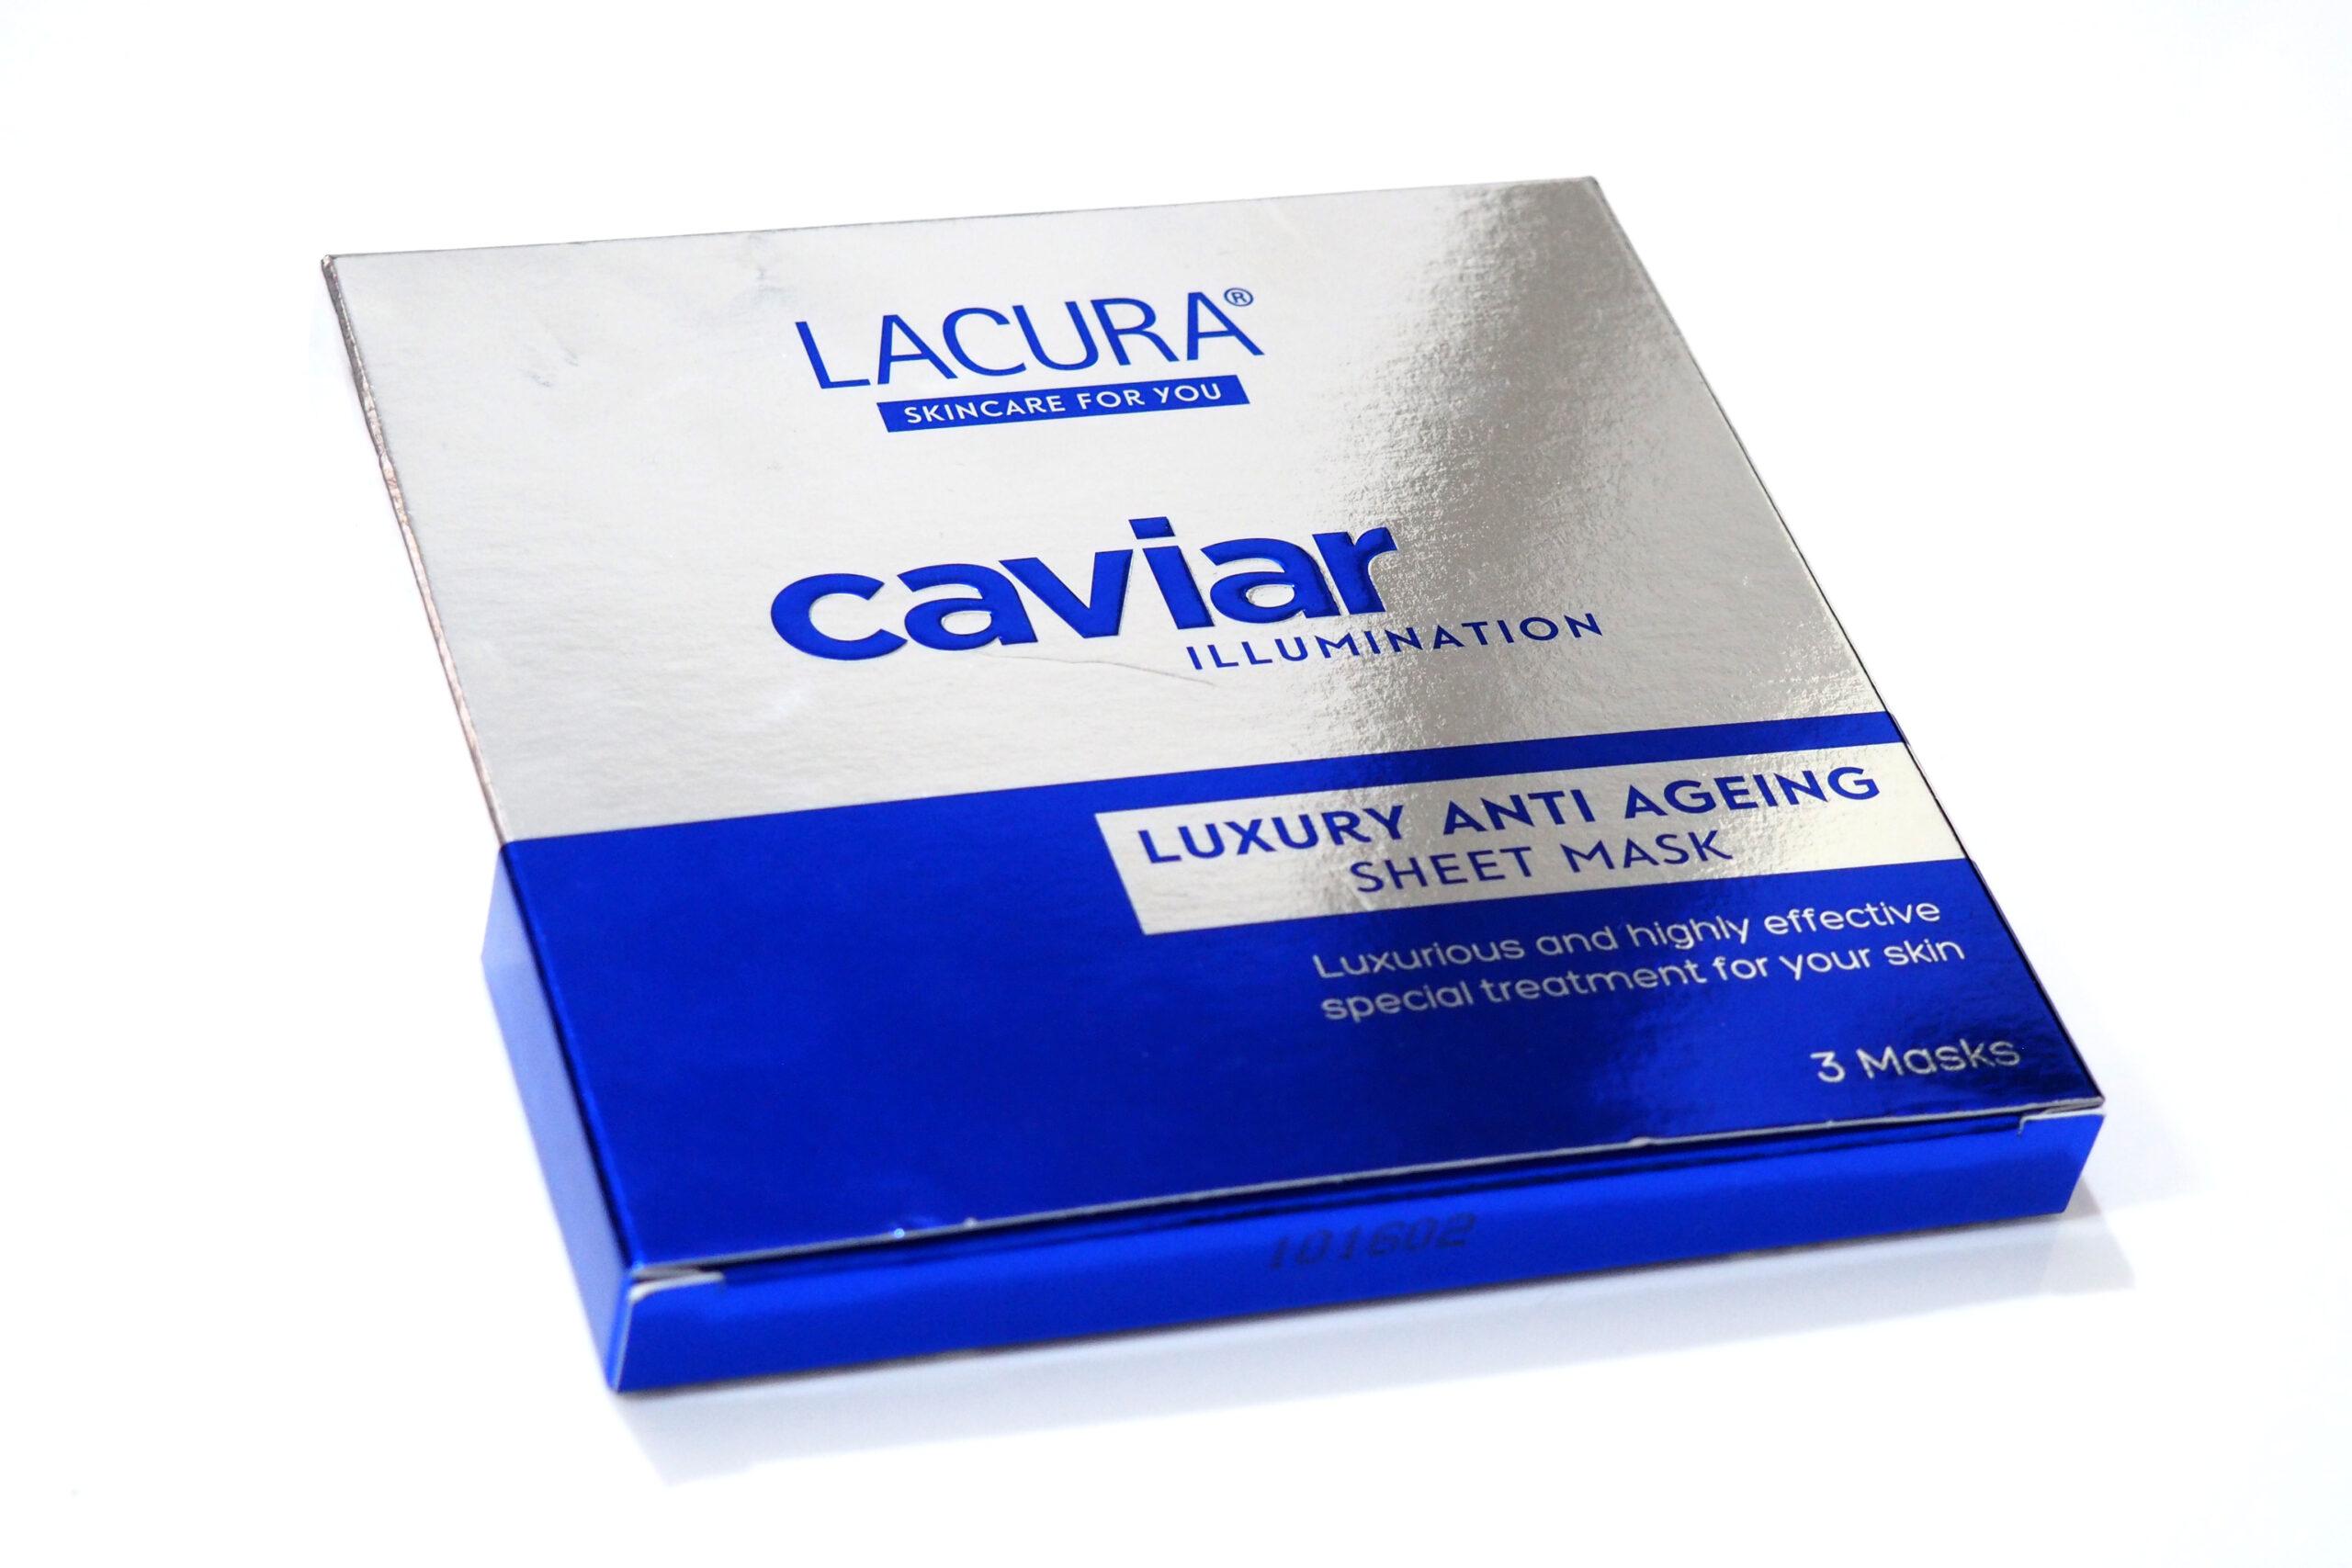 Aldi Lacura Caviar Luxury Anti Ageing Sheet Masks Review 1